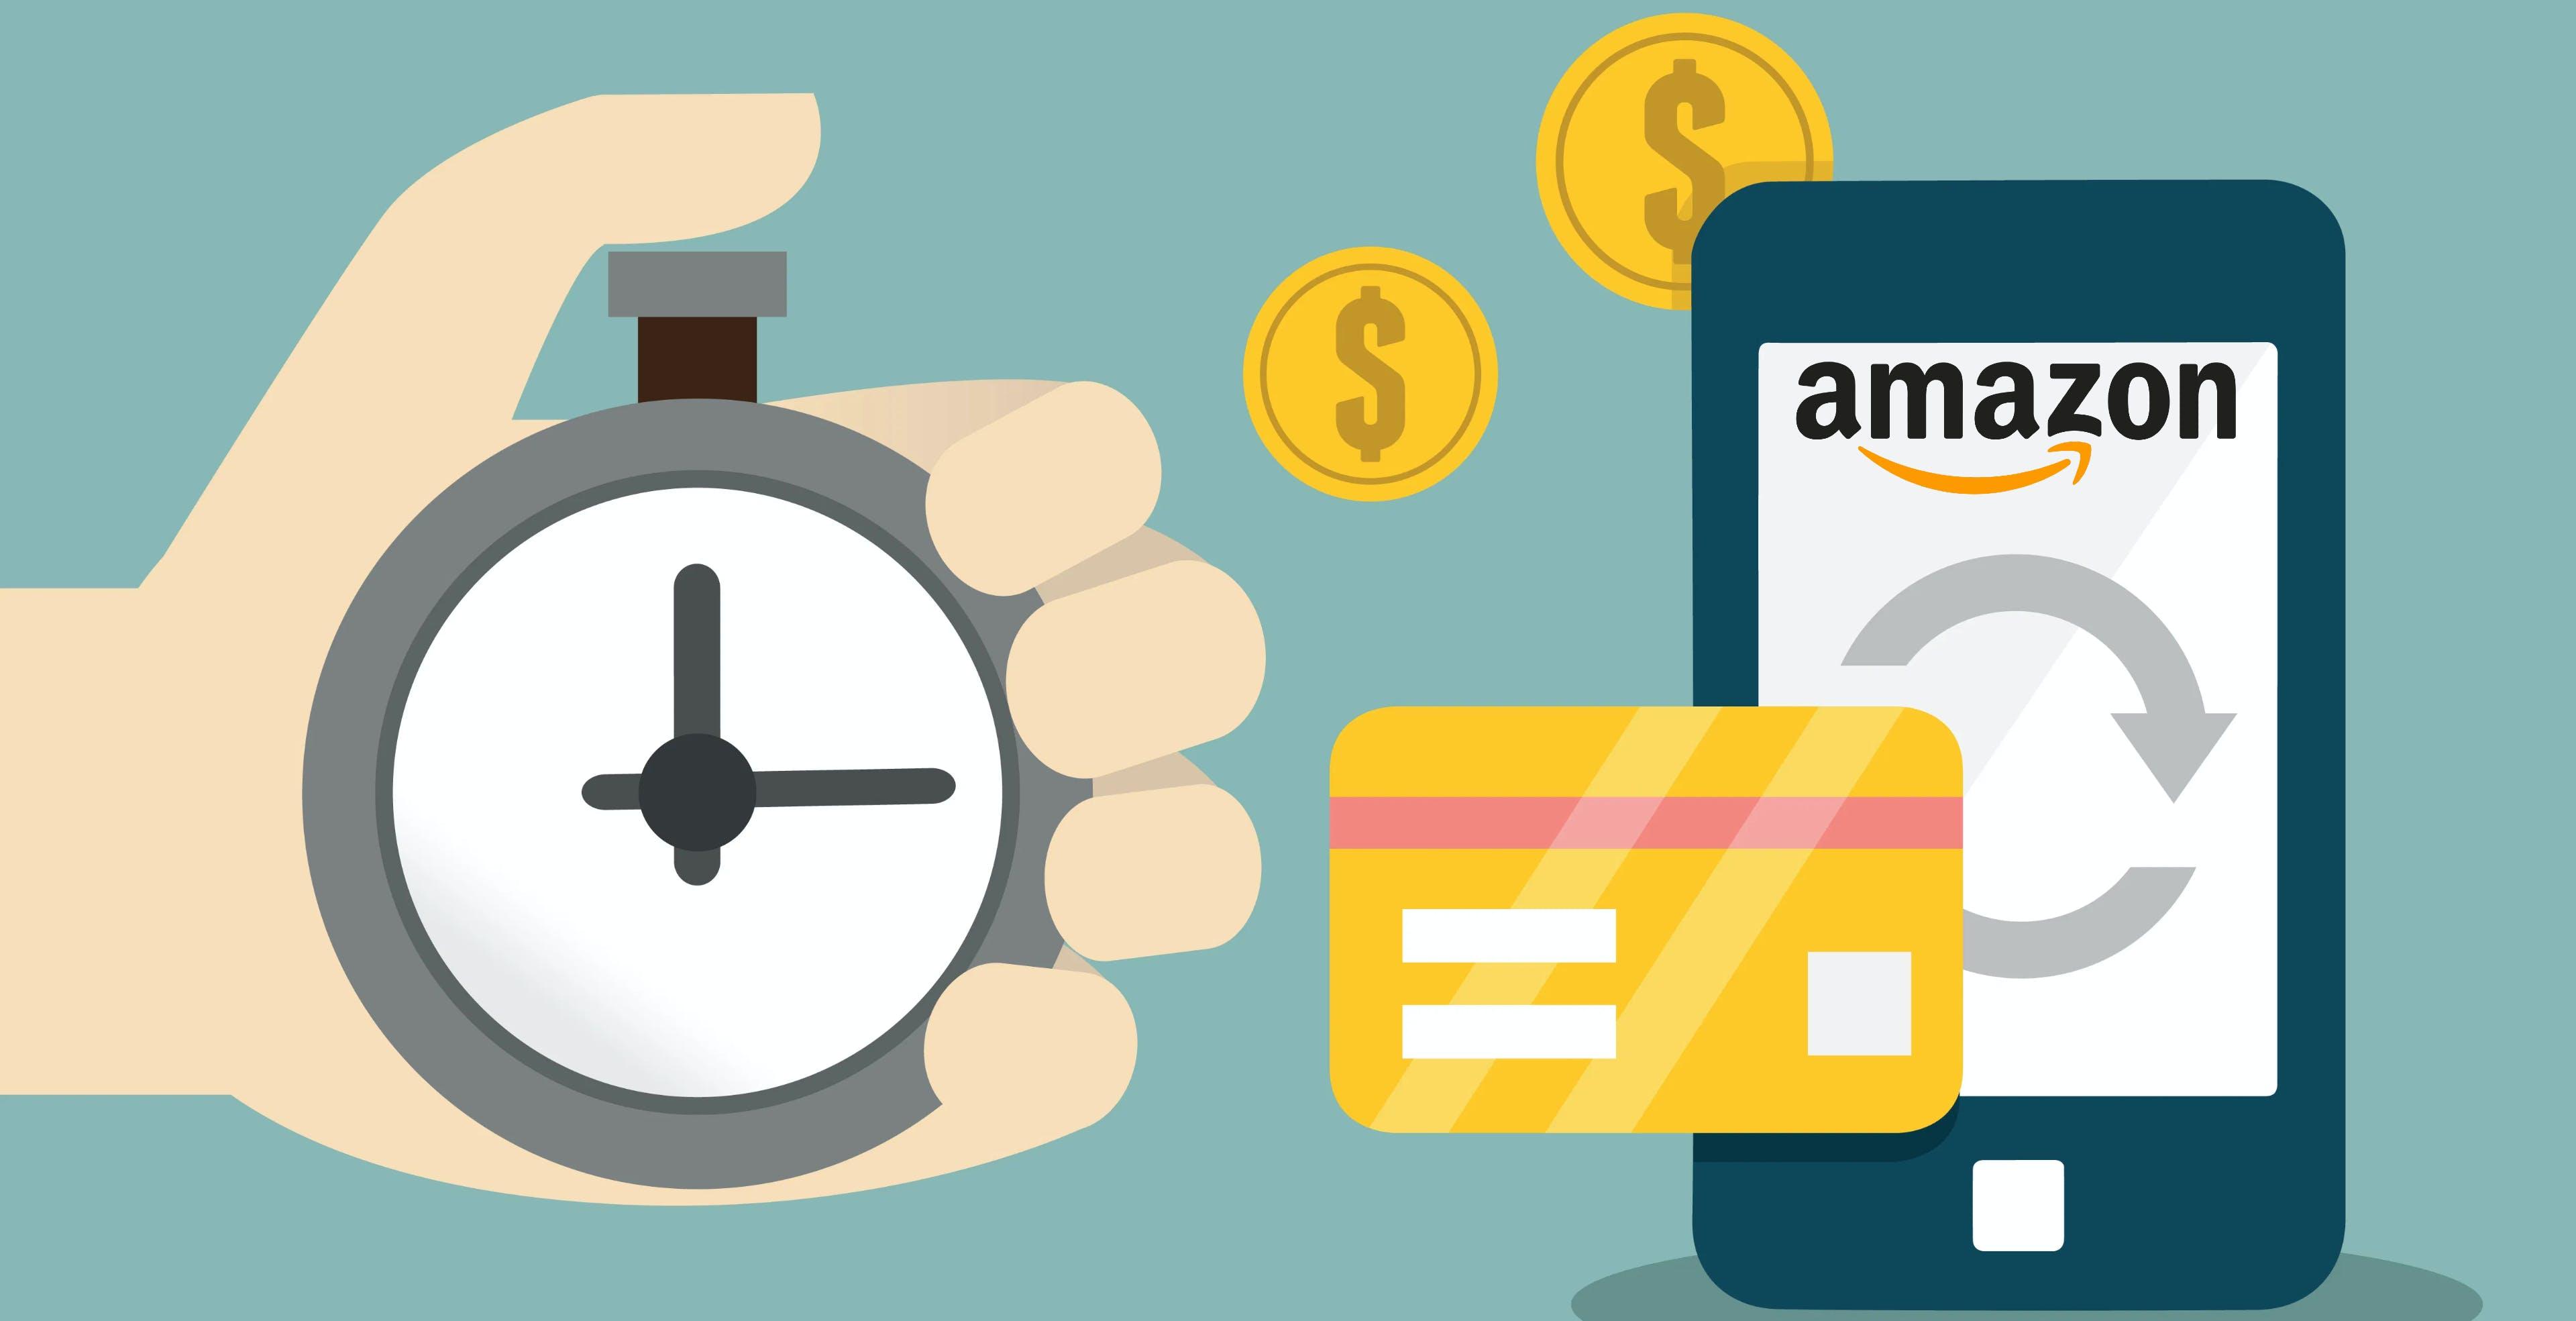 Amazon, più facile comprare a rate: 1.500 euro, 24 rate massime e TAEG 0